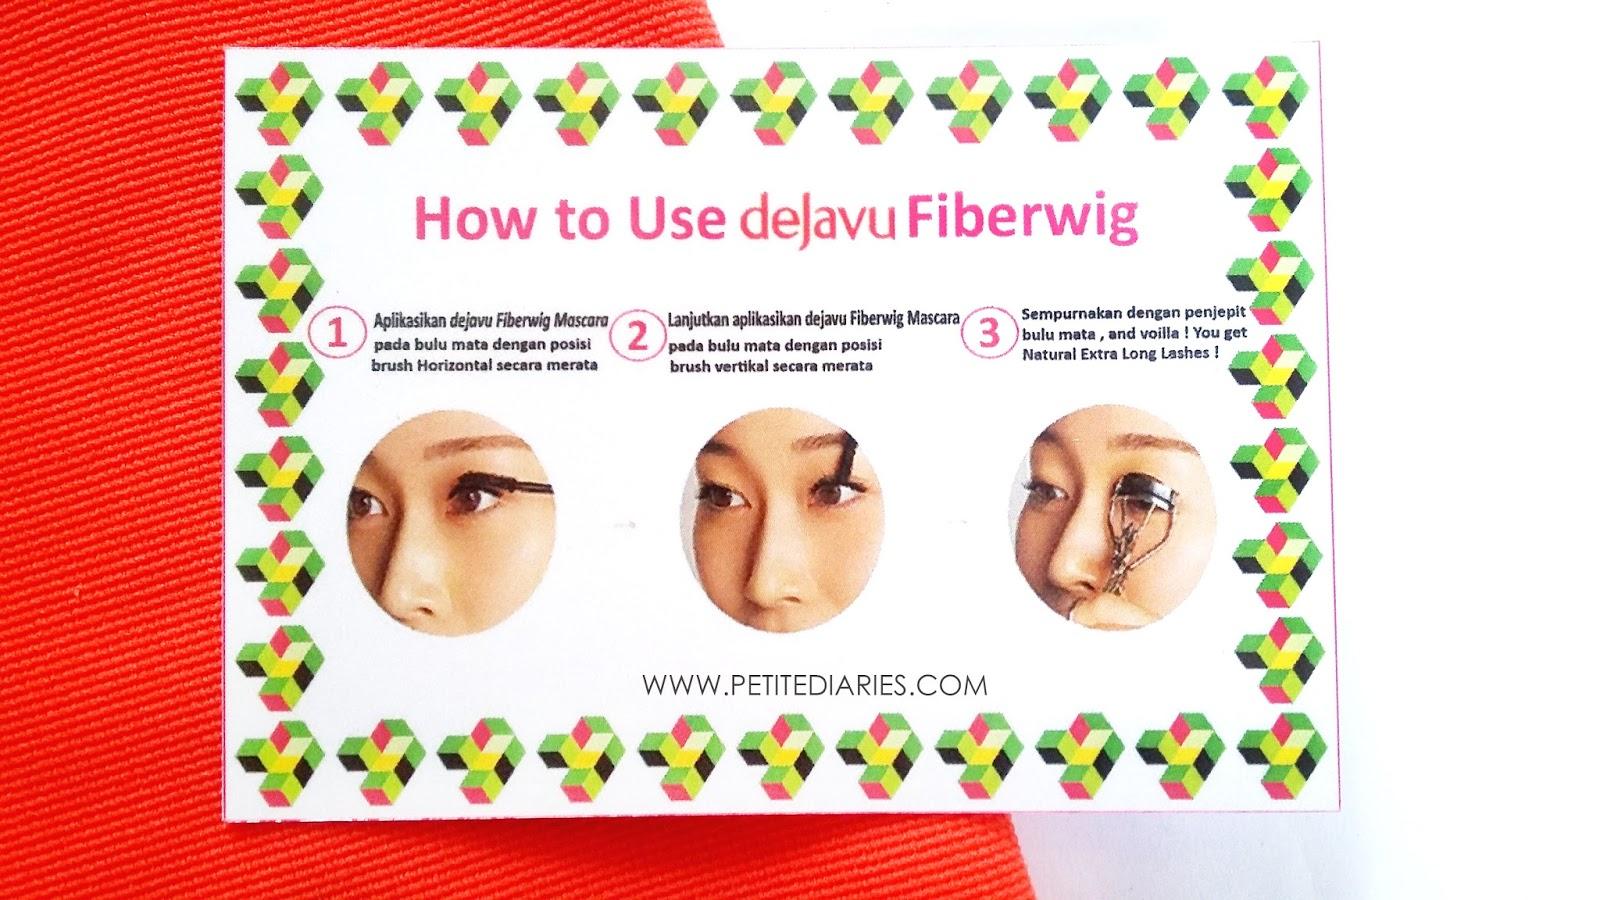 dejavu fiberwig mascara